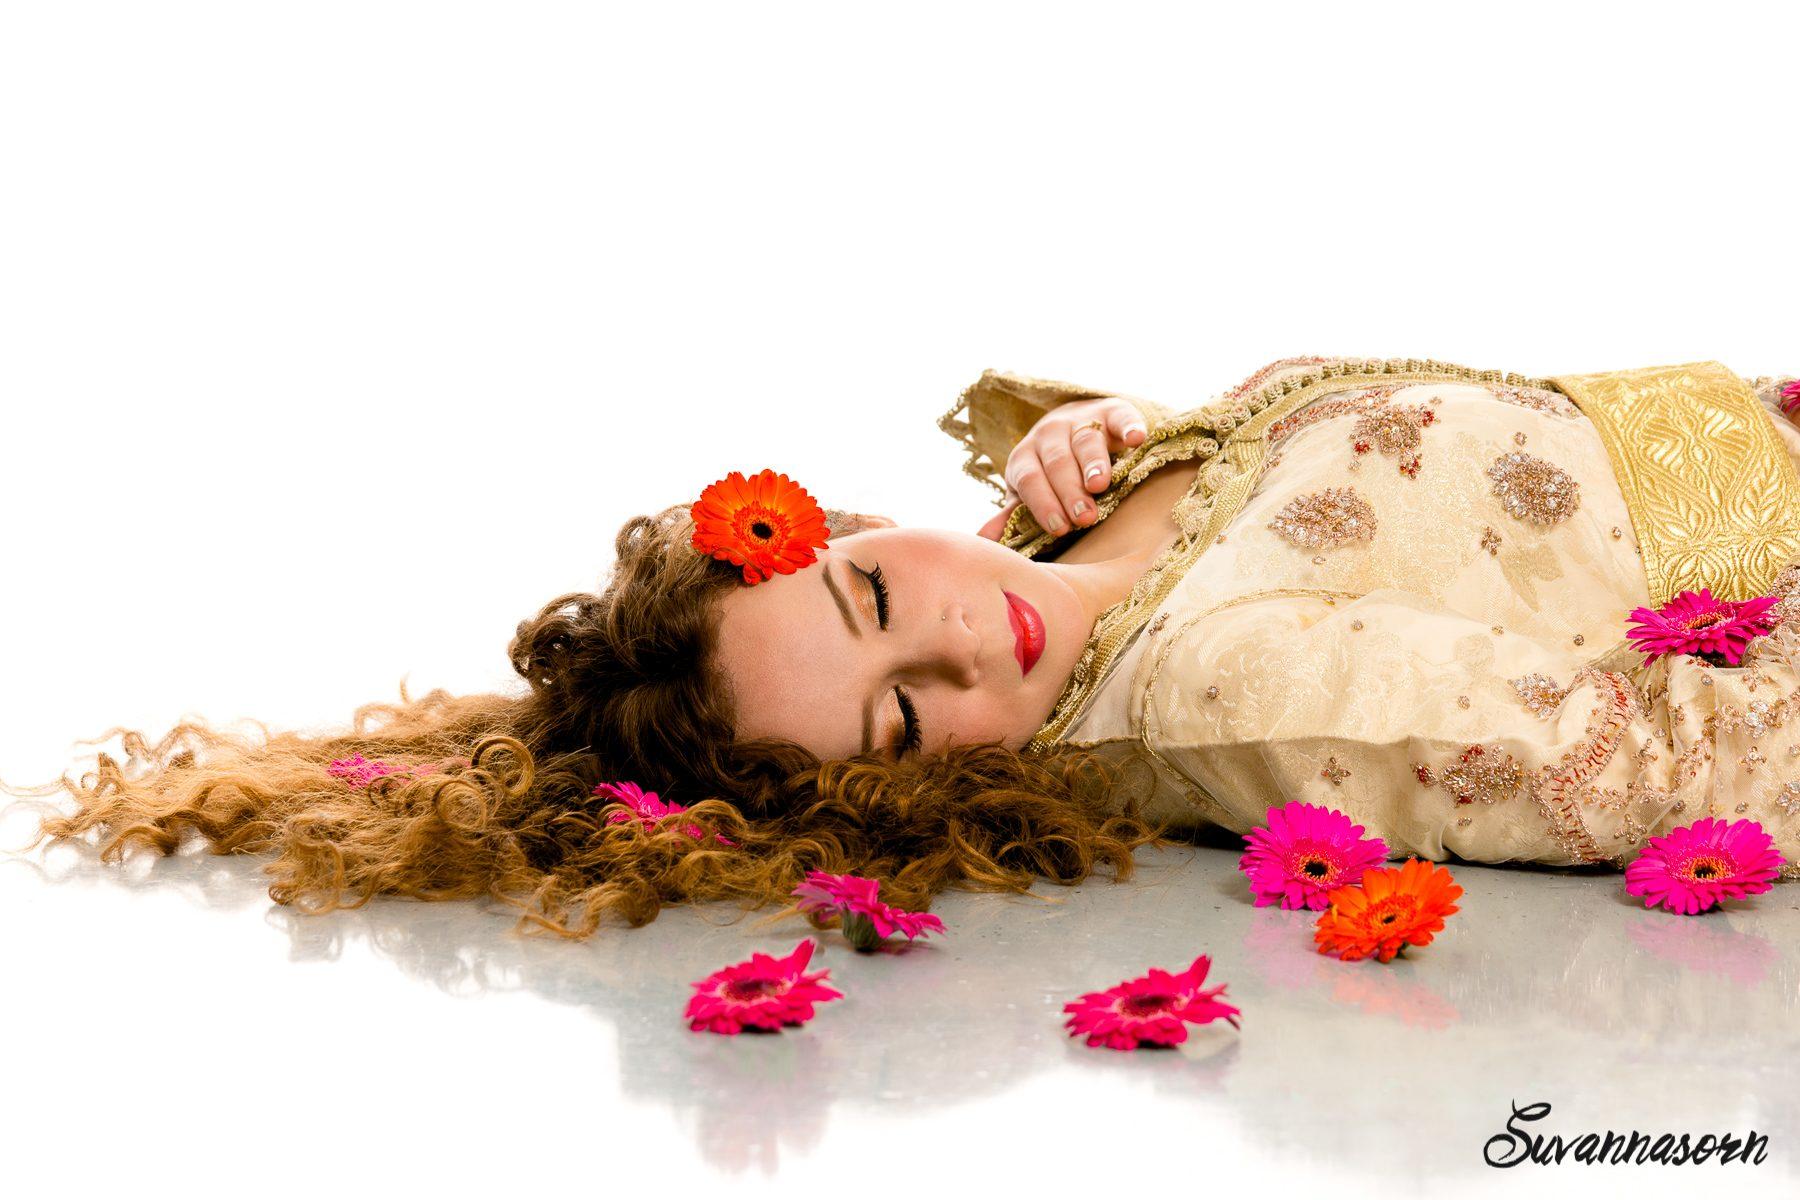 suvannasorn maquillage bronze beauté femme genève maquilleuse artiste photographe